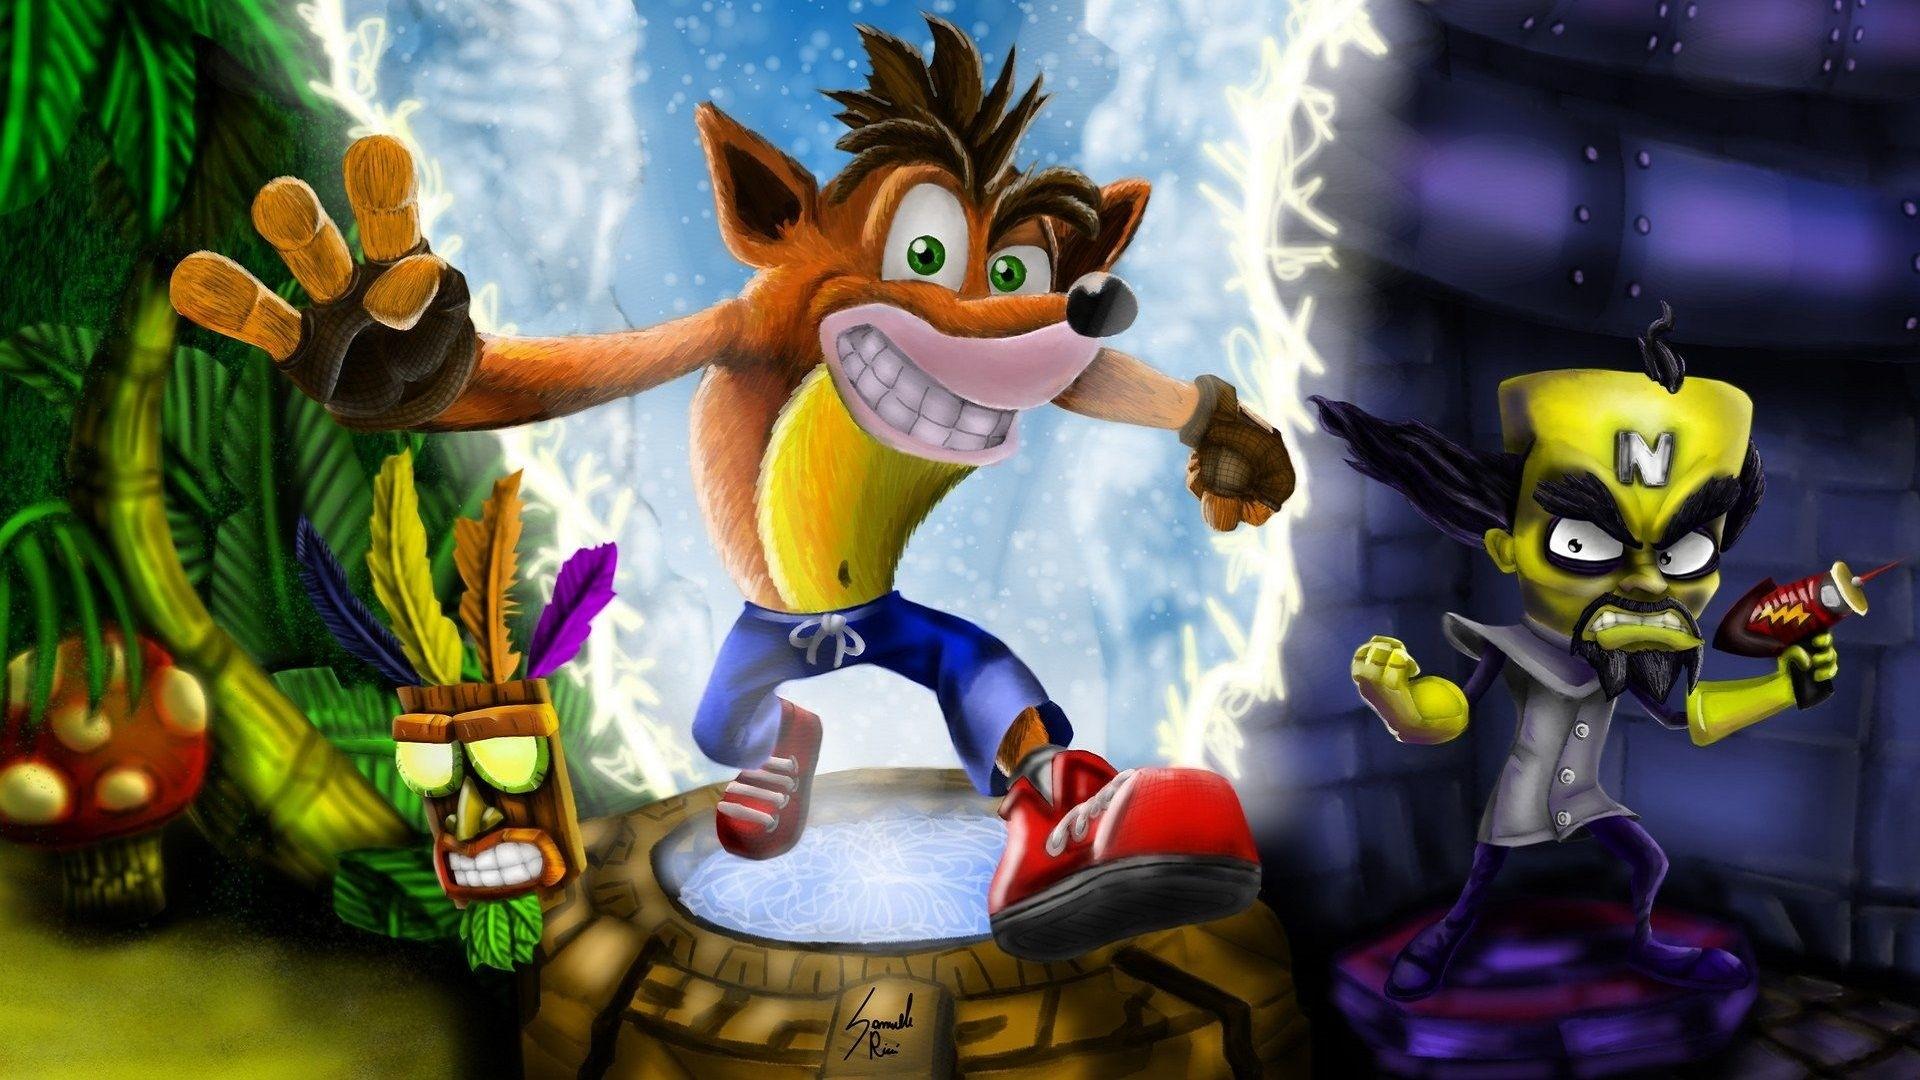 Crash Bandicoot Full HD Wallpaper